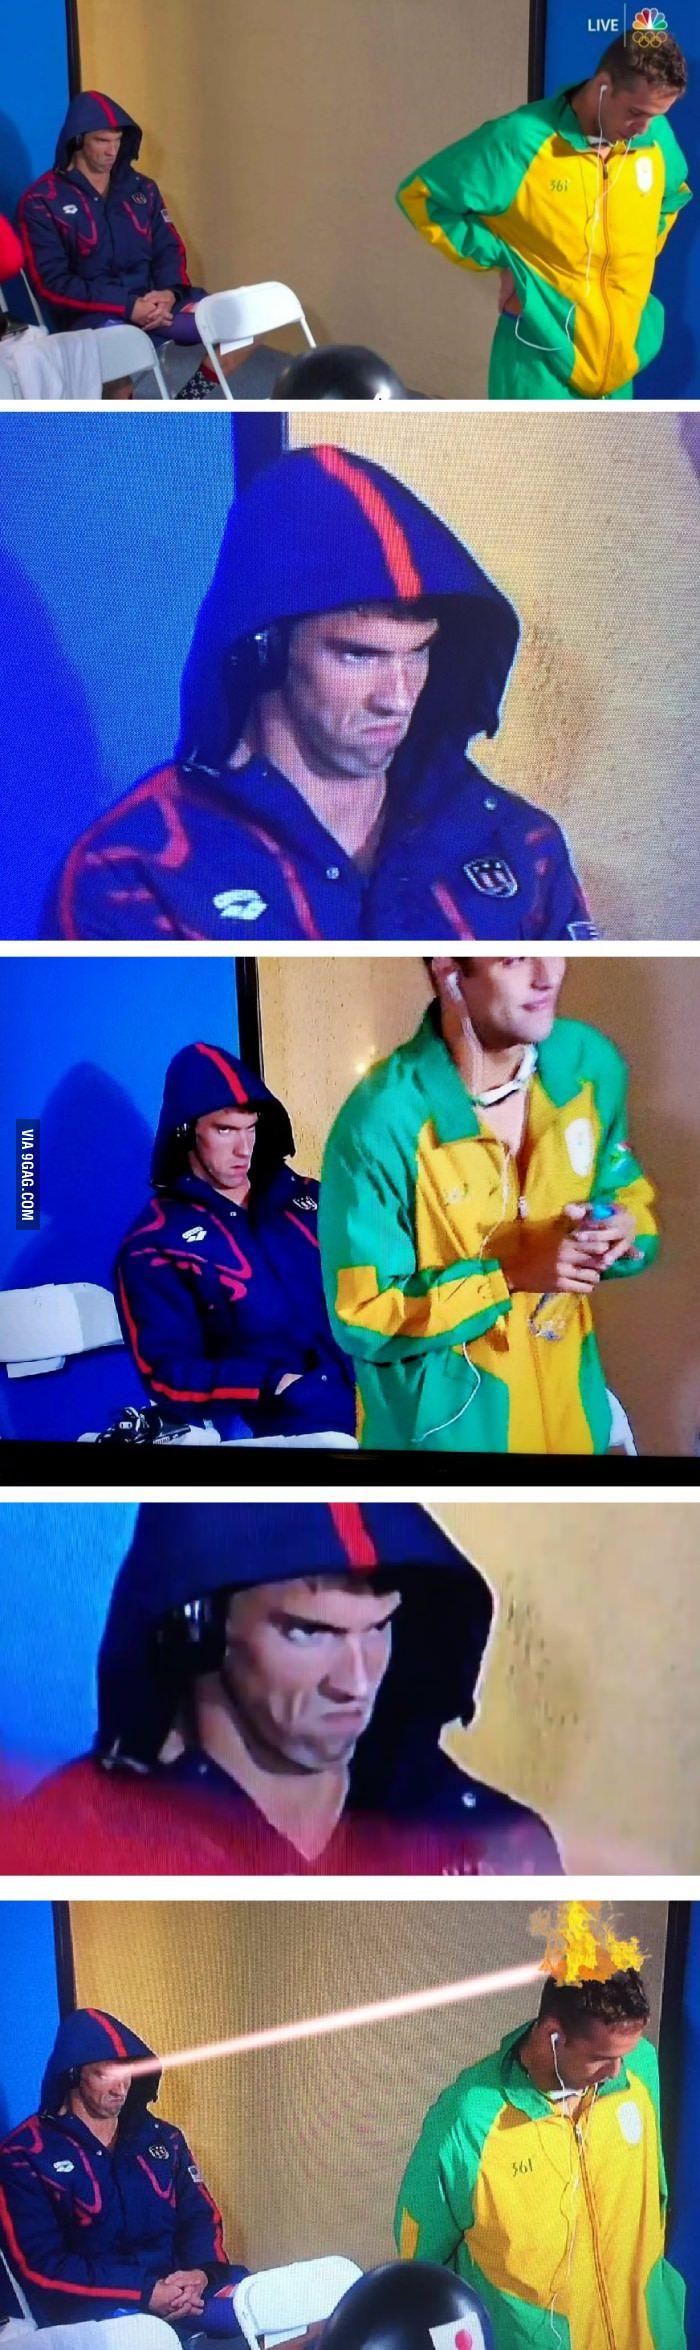 Michael Phelps glowering at his rival Chad Le Clos at the 2016 Olympics - 9GAG